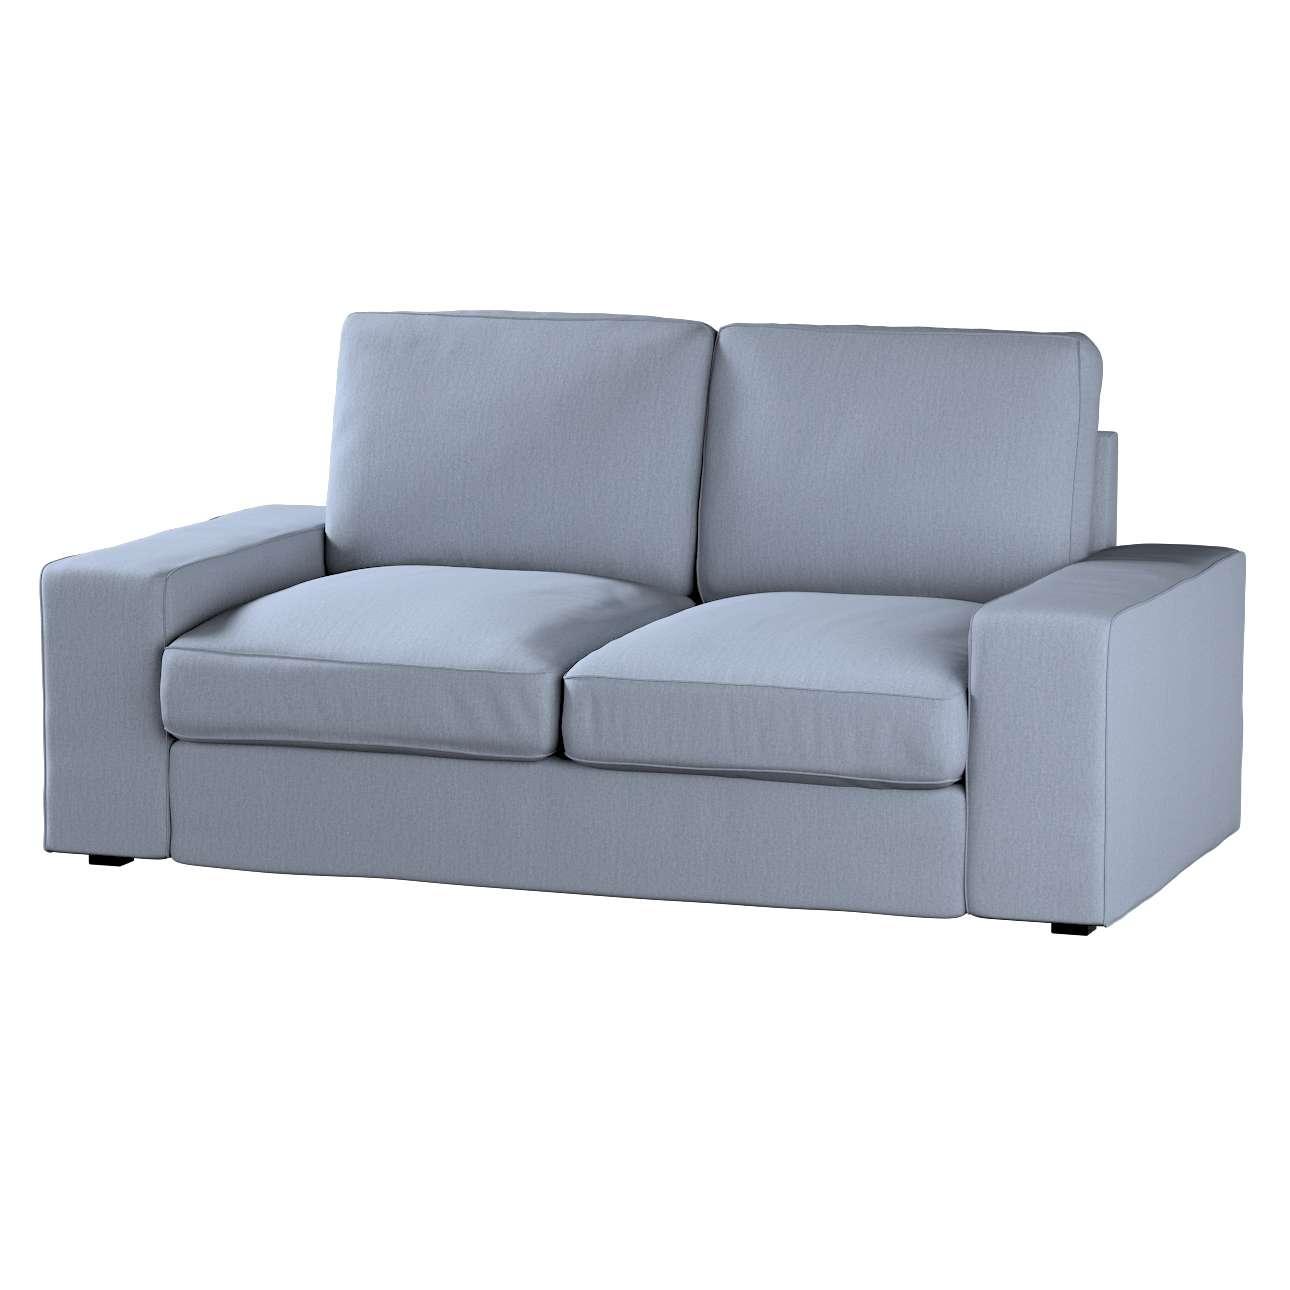 Kivik 2-Sitzer Sofabezug Sofa Kivik 2-Sitzer von der Kollektion Chenille , Stoff: 702-13